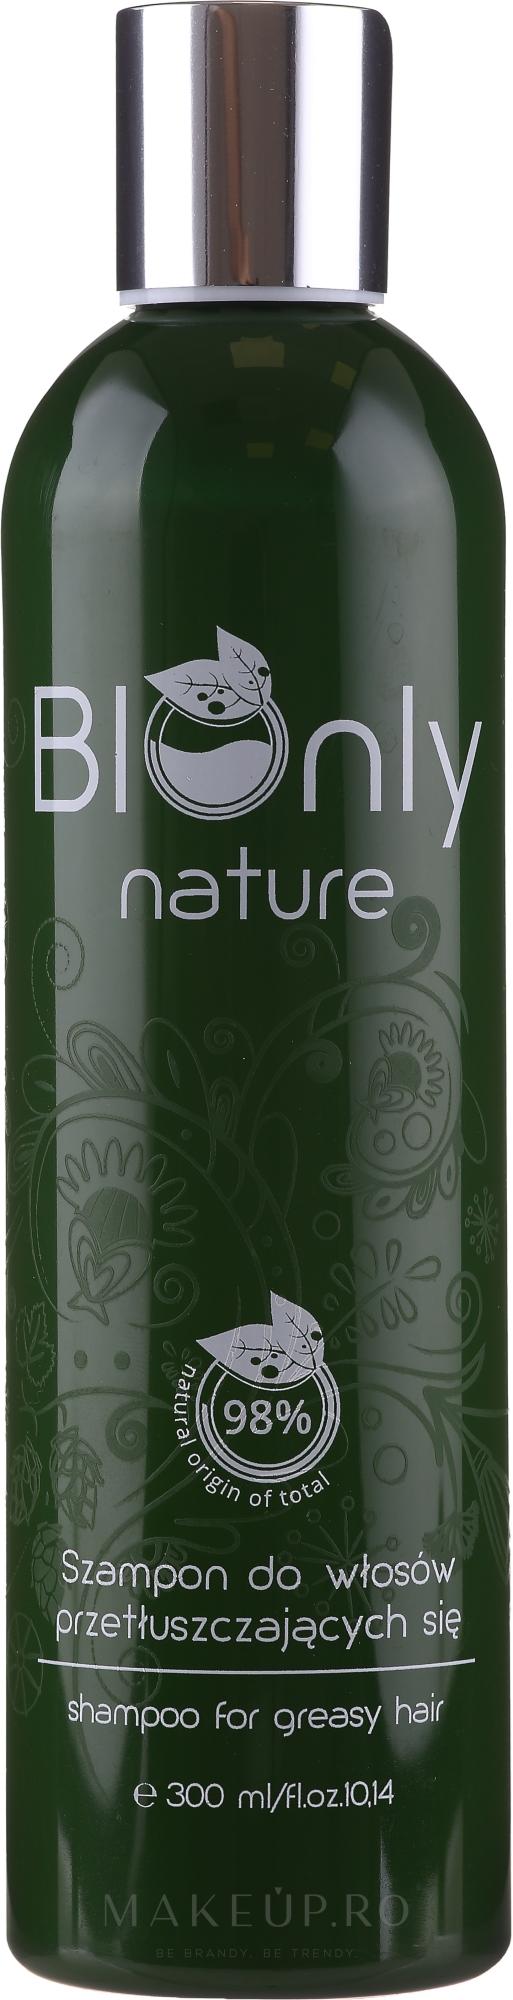 Șampon pentru păr gras - BIOnly Nature Shampoo For Greasy Hair — Imagine 300 ml